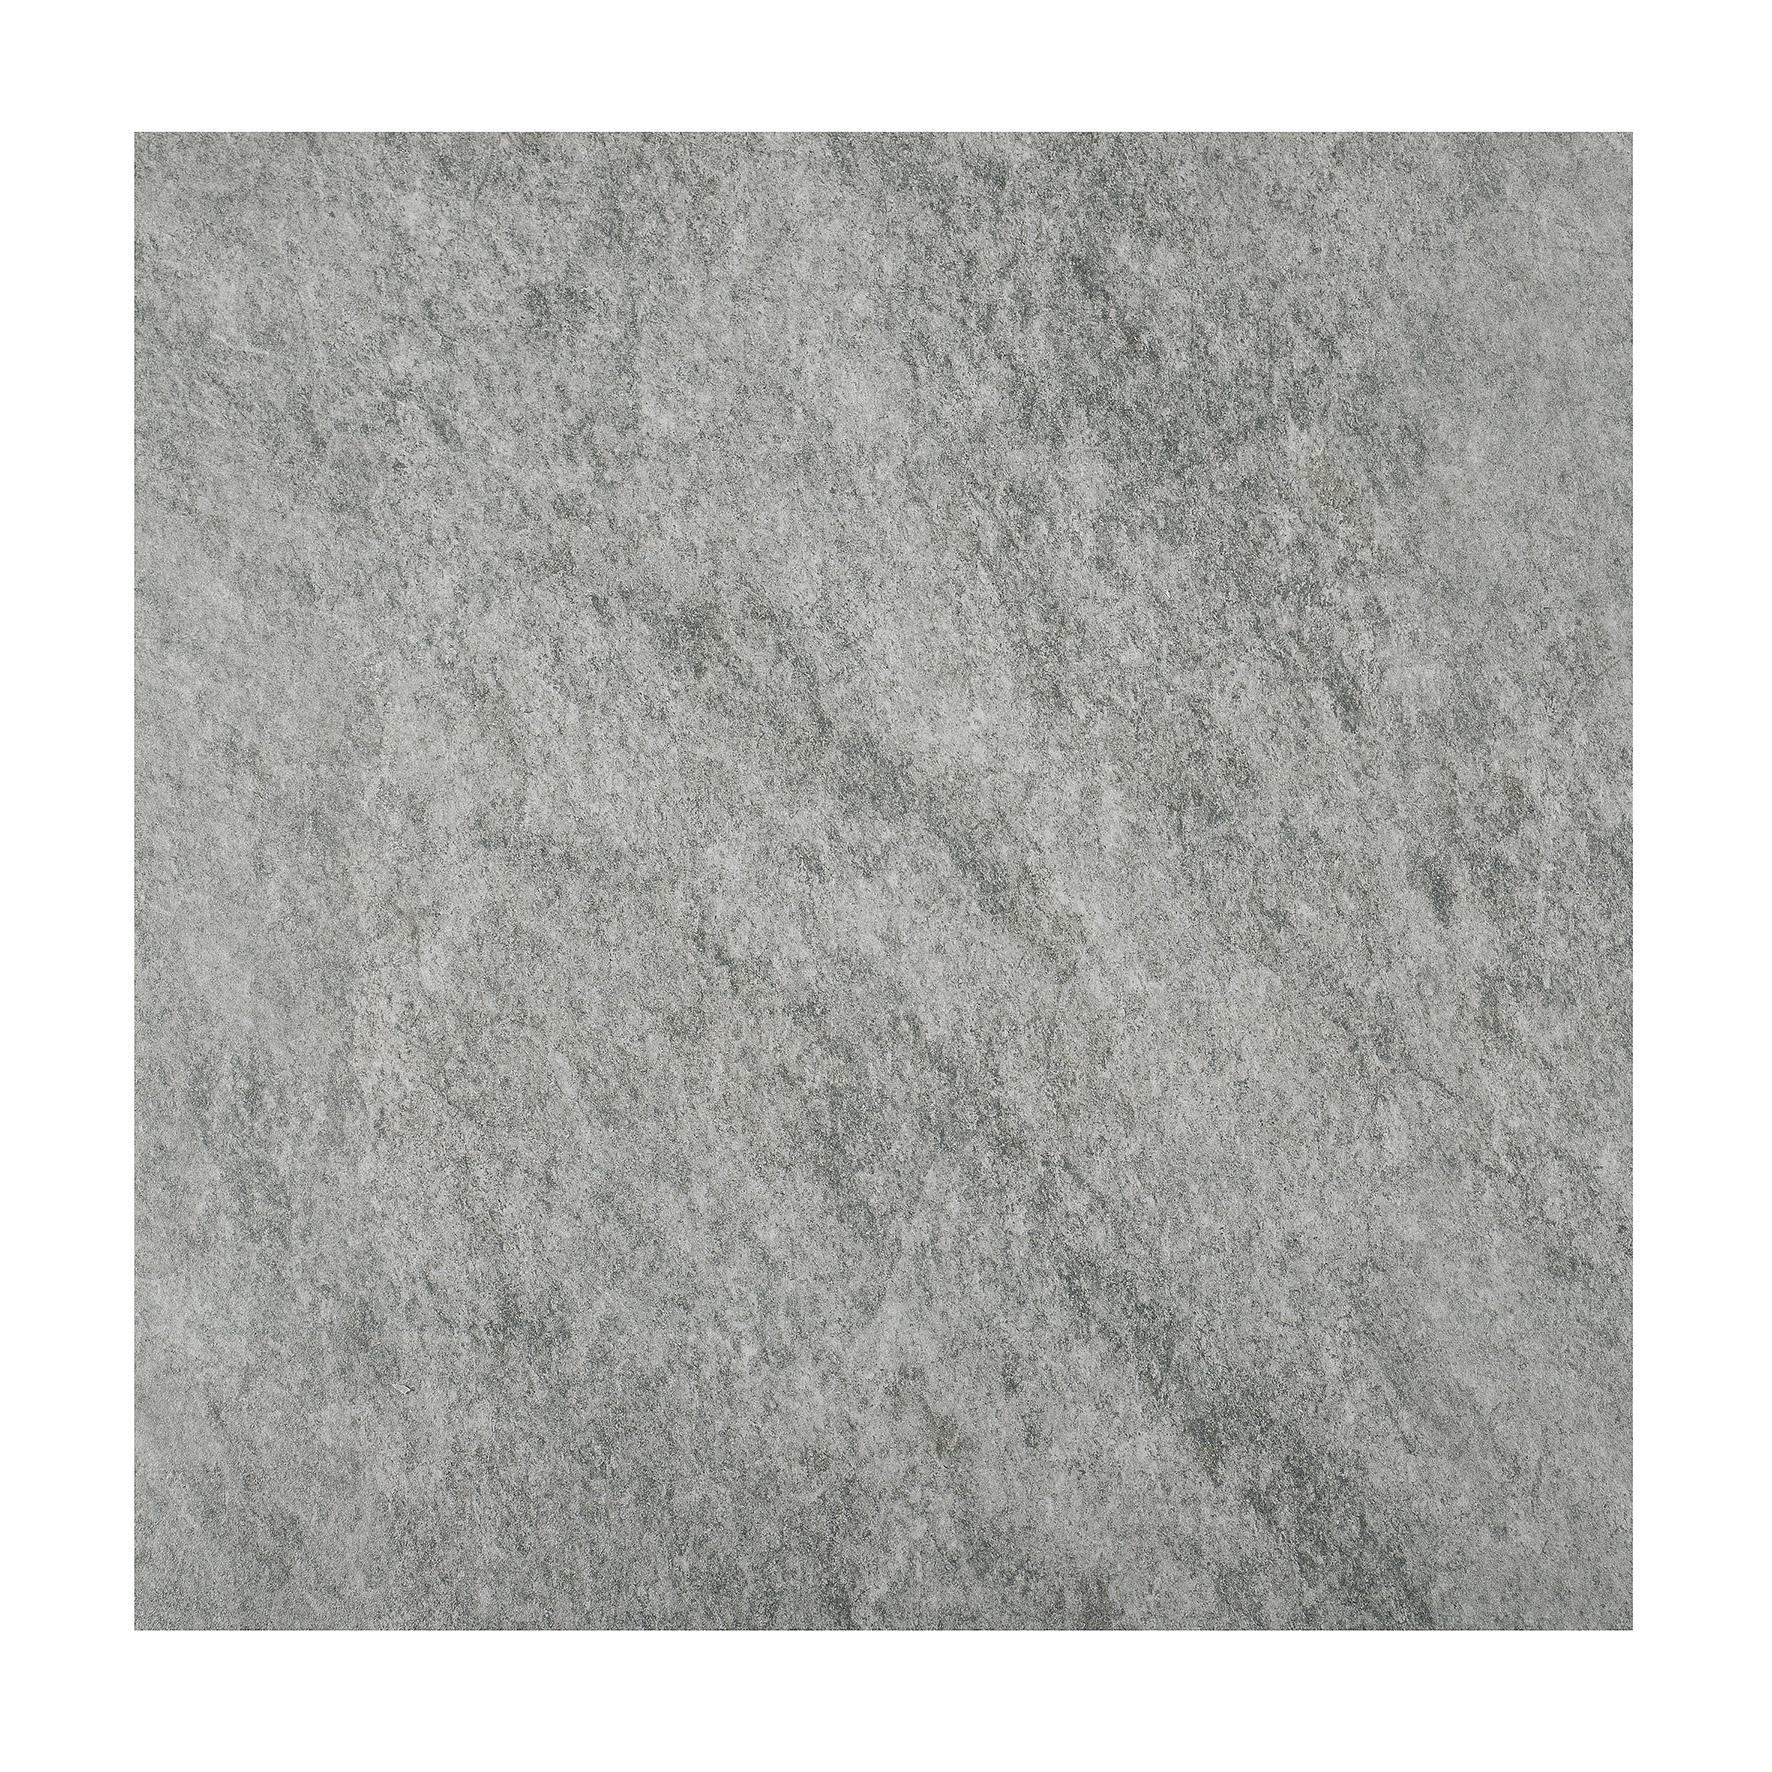 Gardenlux | Ceramica 60x60x2 | Mills Gris